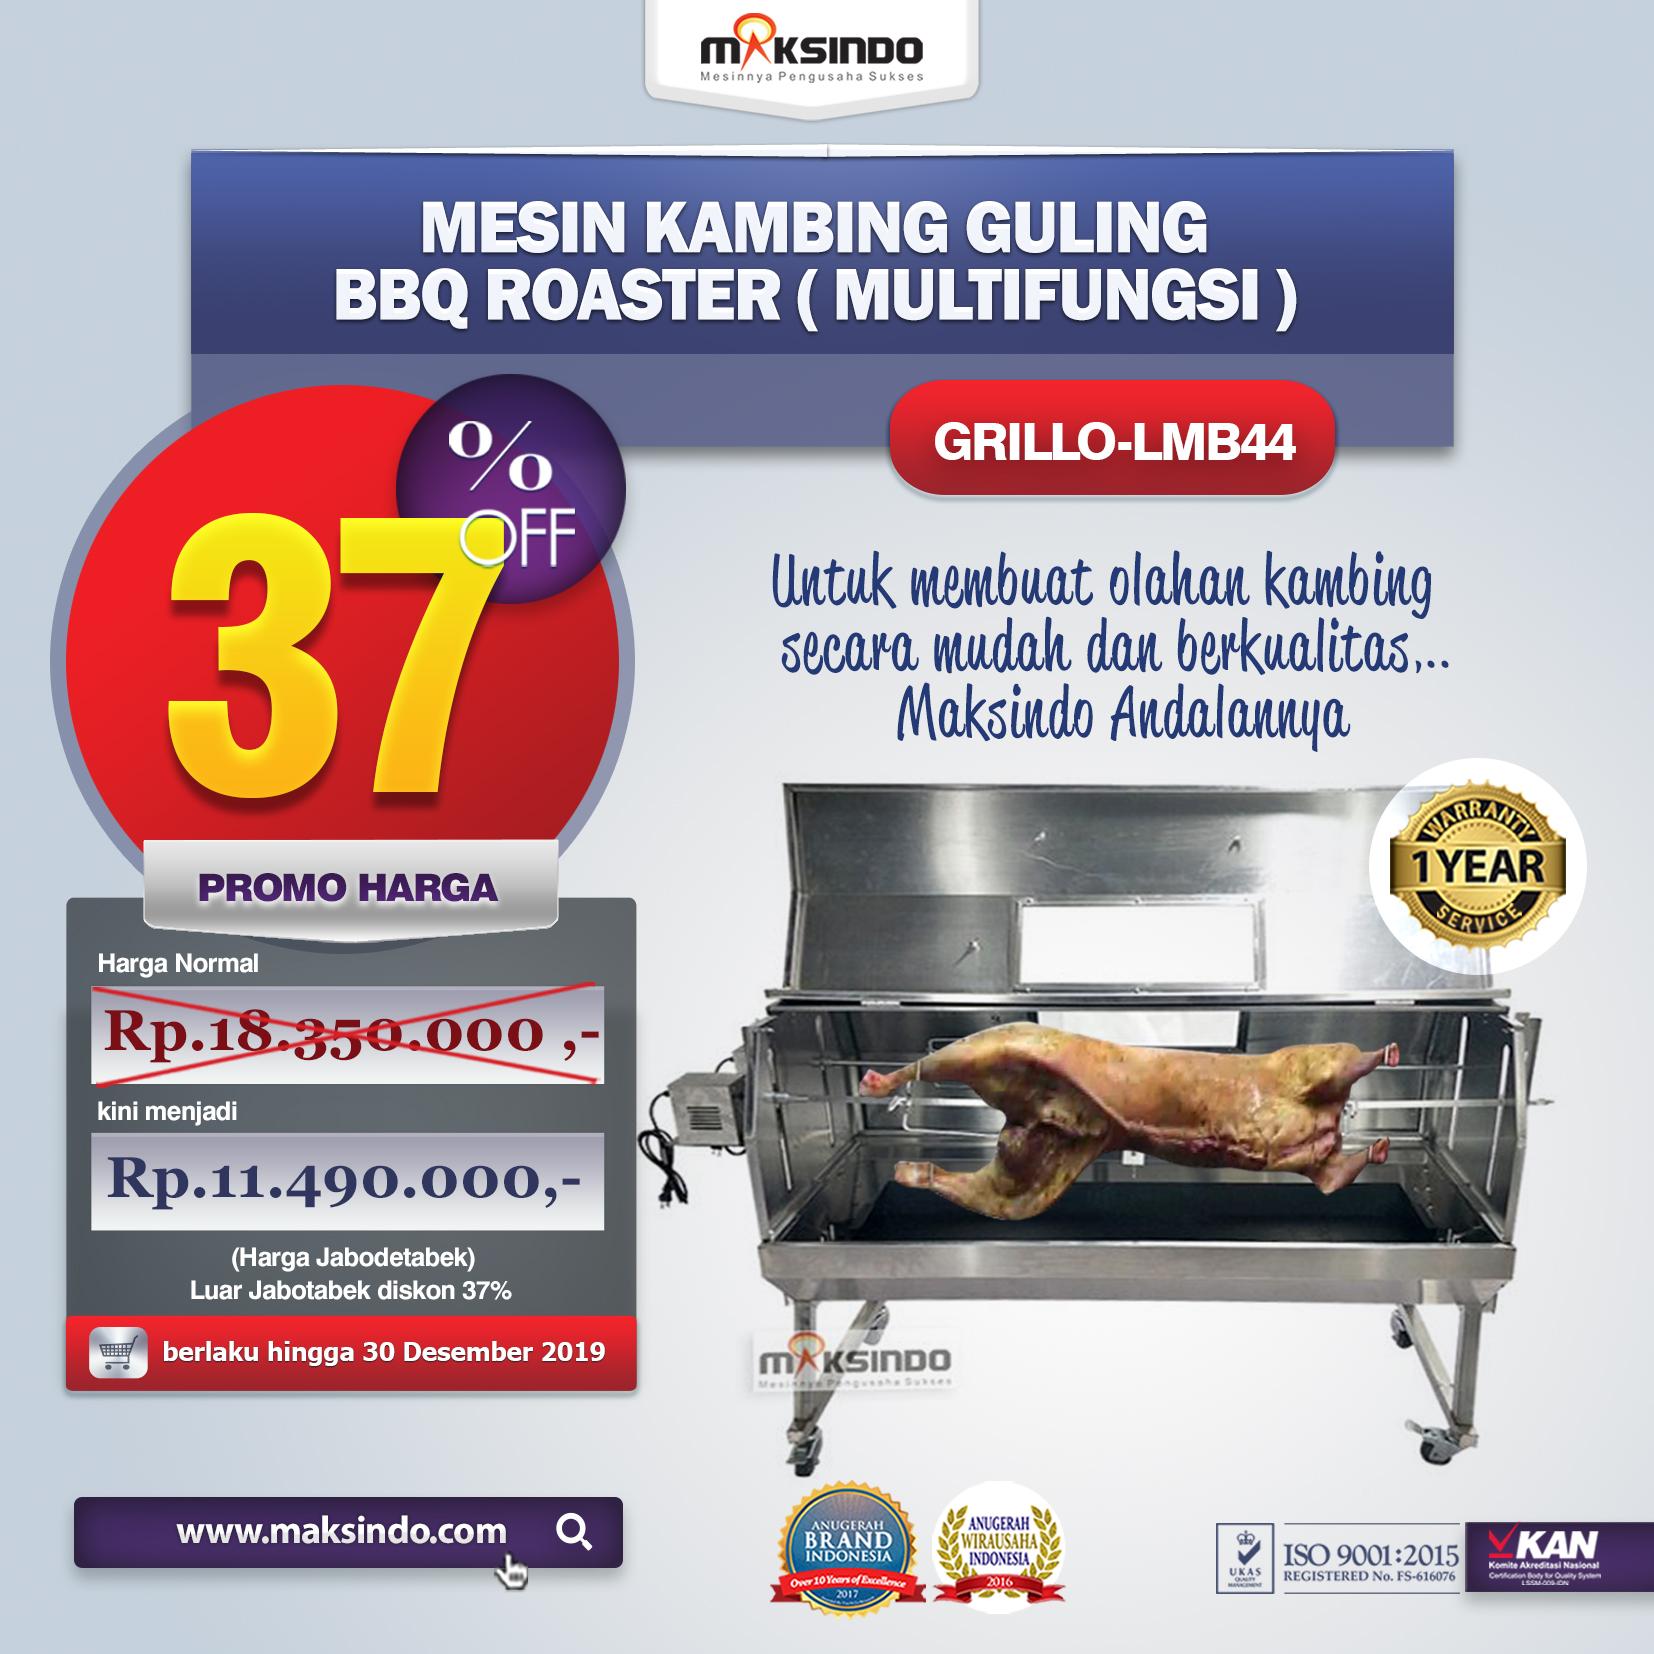 Jual Mesin Kambing Guling BBQ Roaster (GRILLO-LMB44) di Tangerang